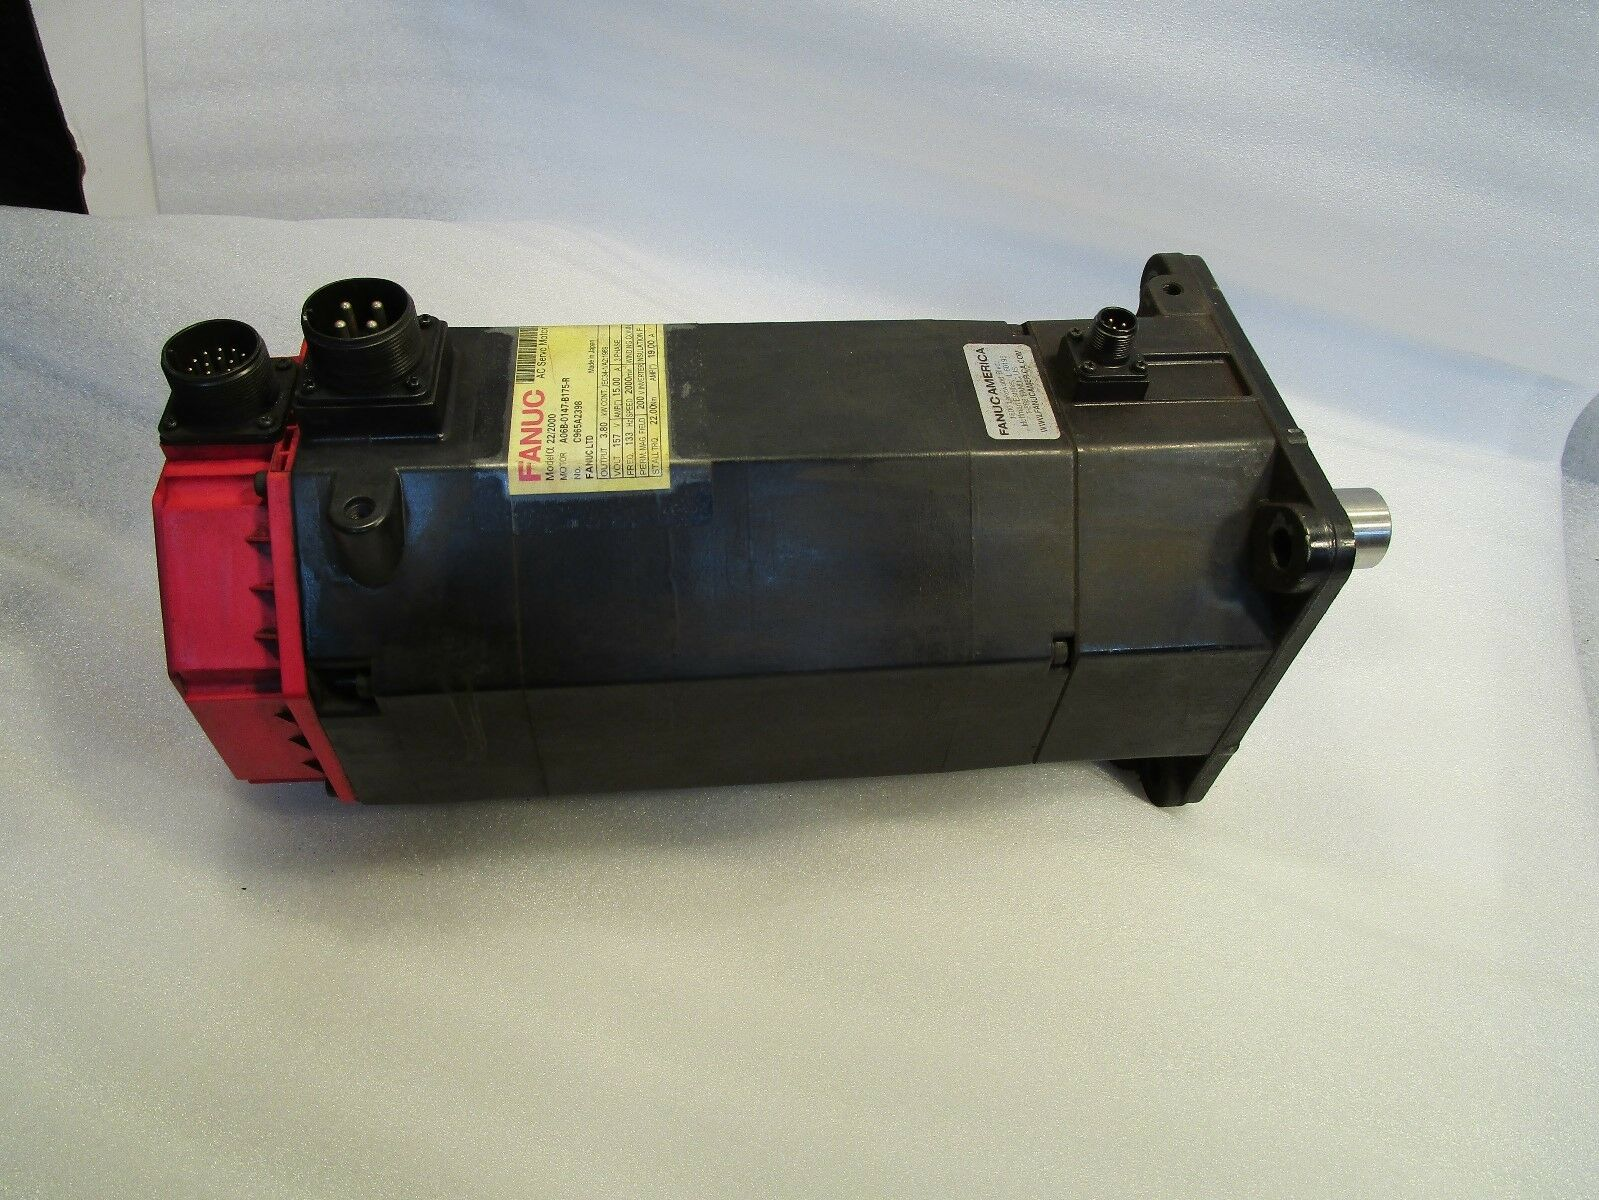 Fanuc Servo Motor Alpha 22/2000 A06B-0147-B175-R Servo Motor